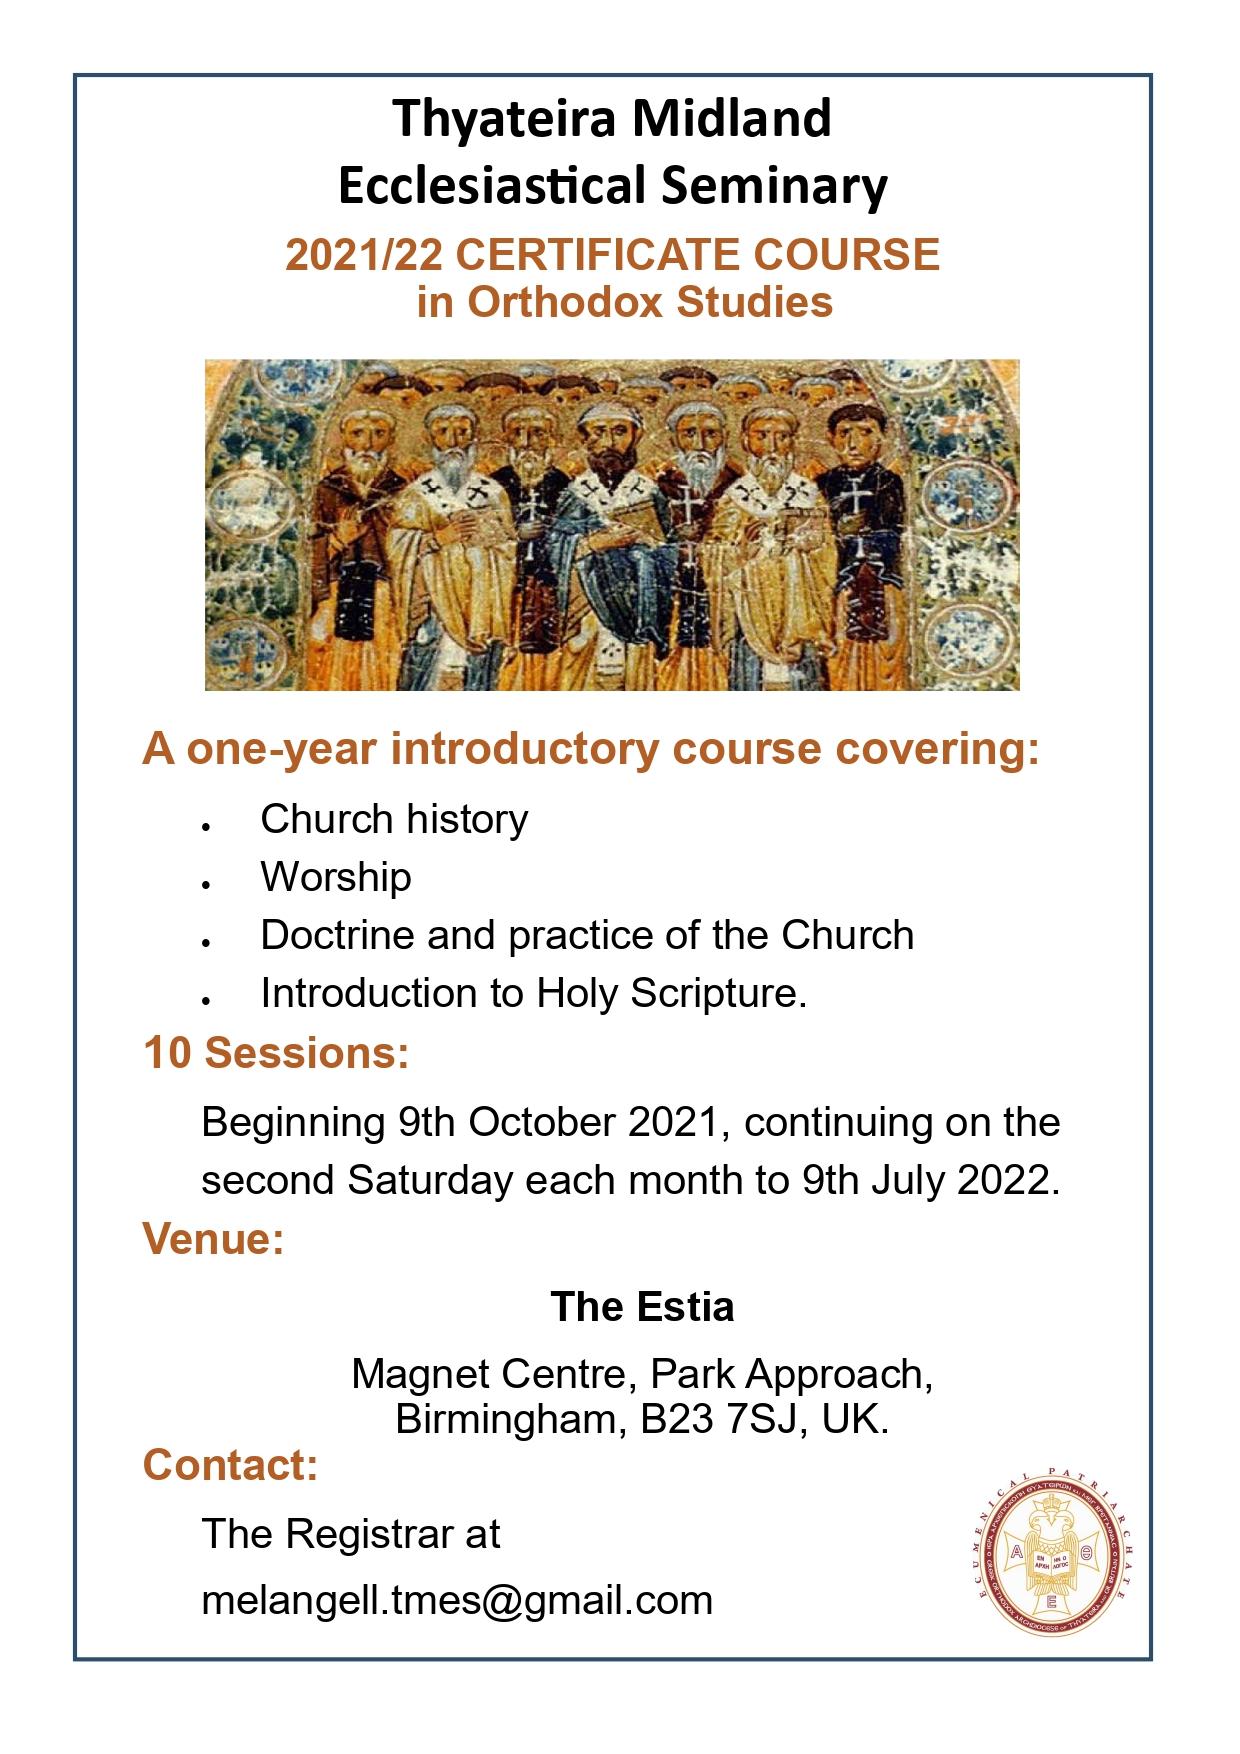 Thyateira Midland Ecclesiastical Seminary 2021-2022